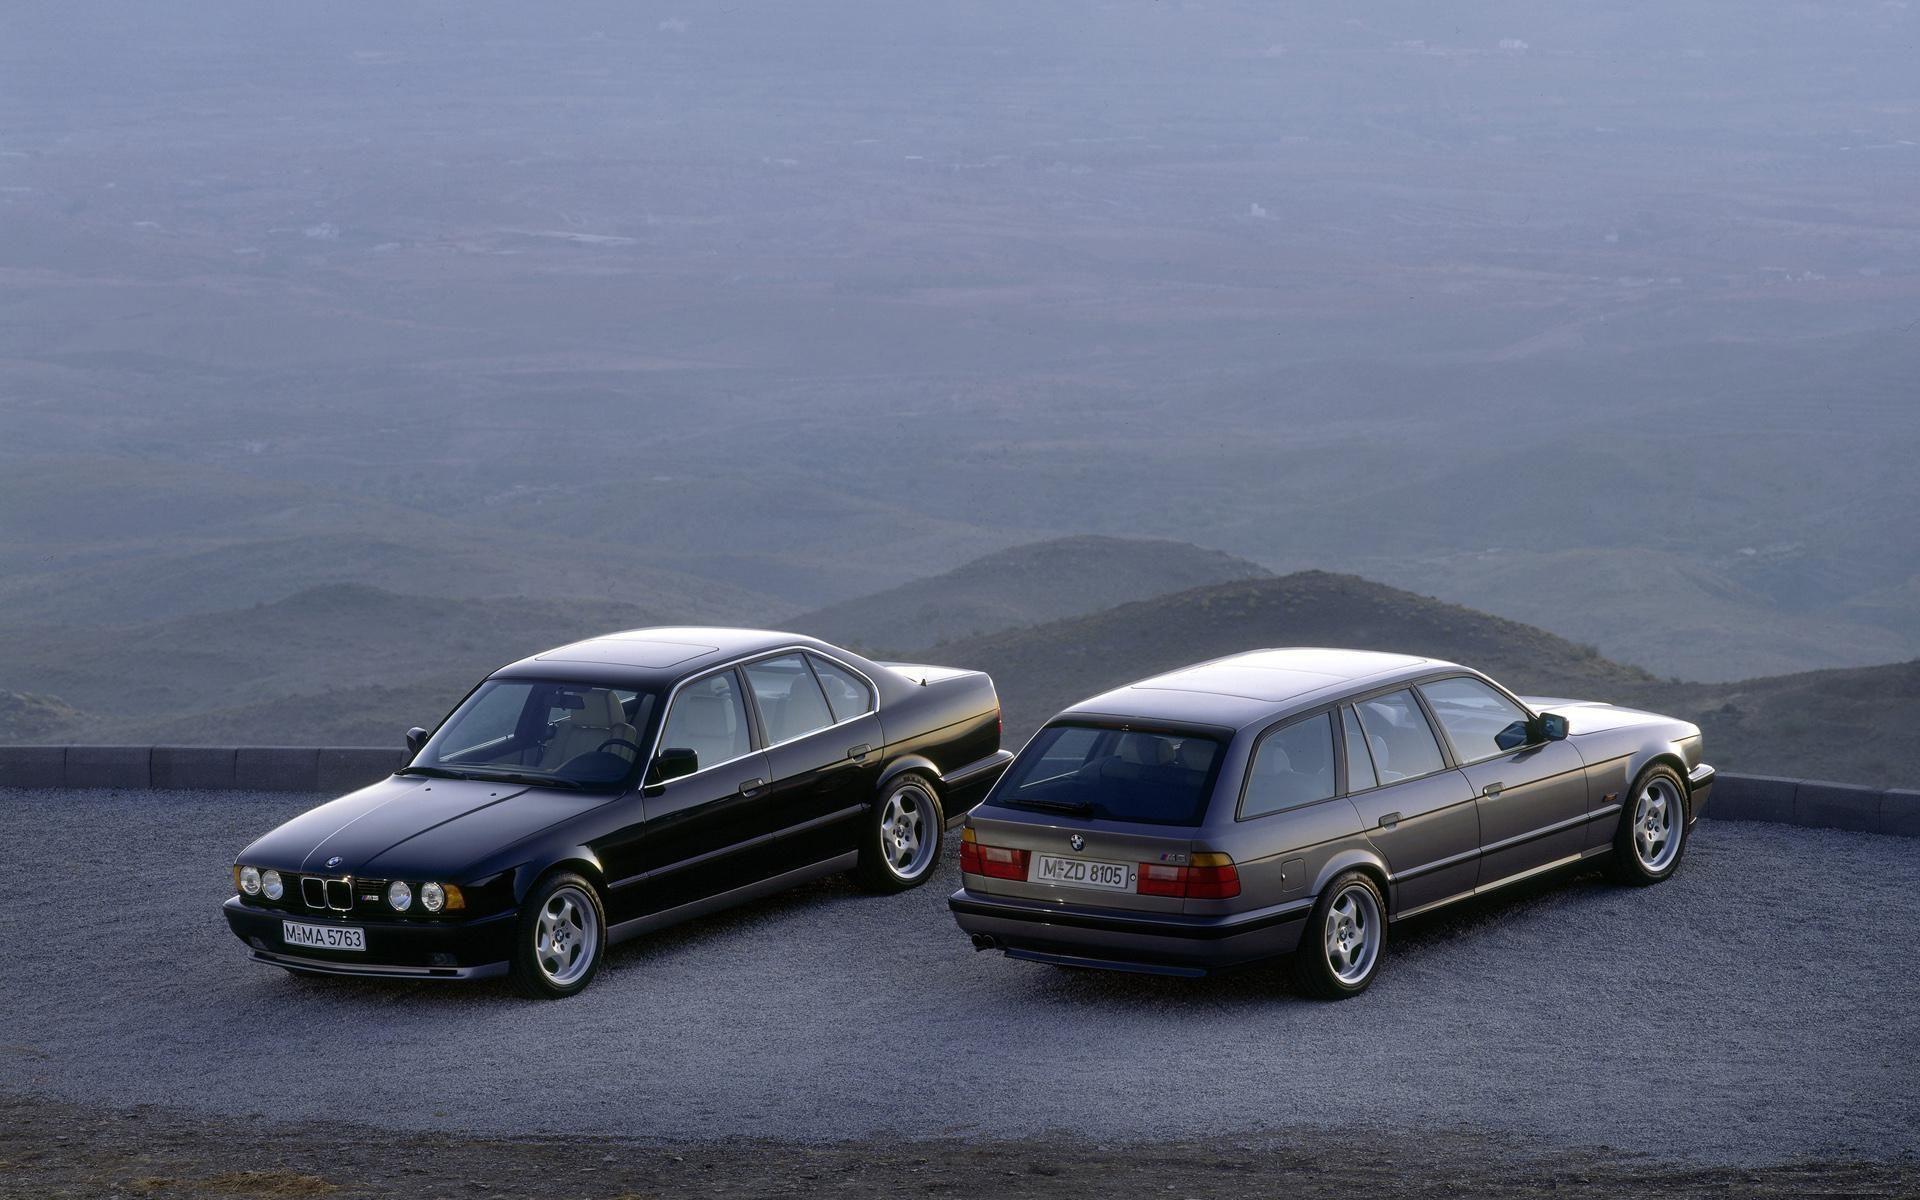 European Bmw M5 Sedan And Touring Bmw E34 Bmw Bmw M5